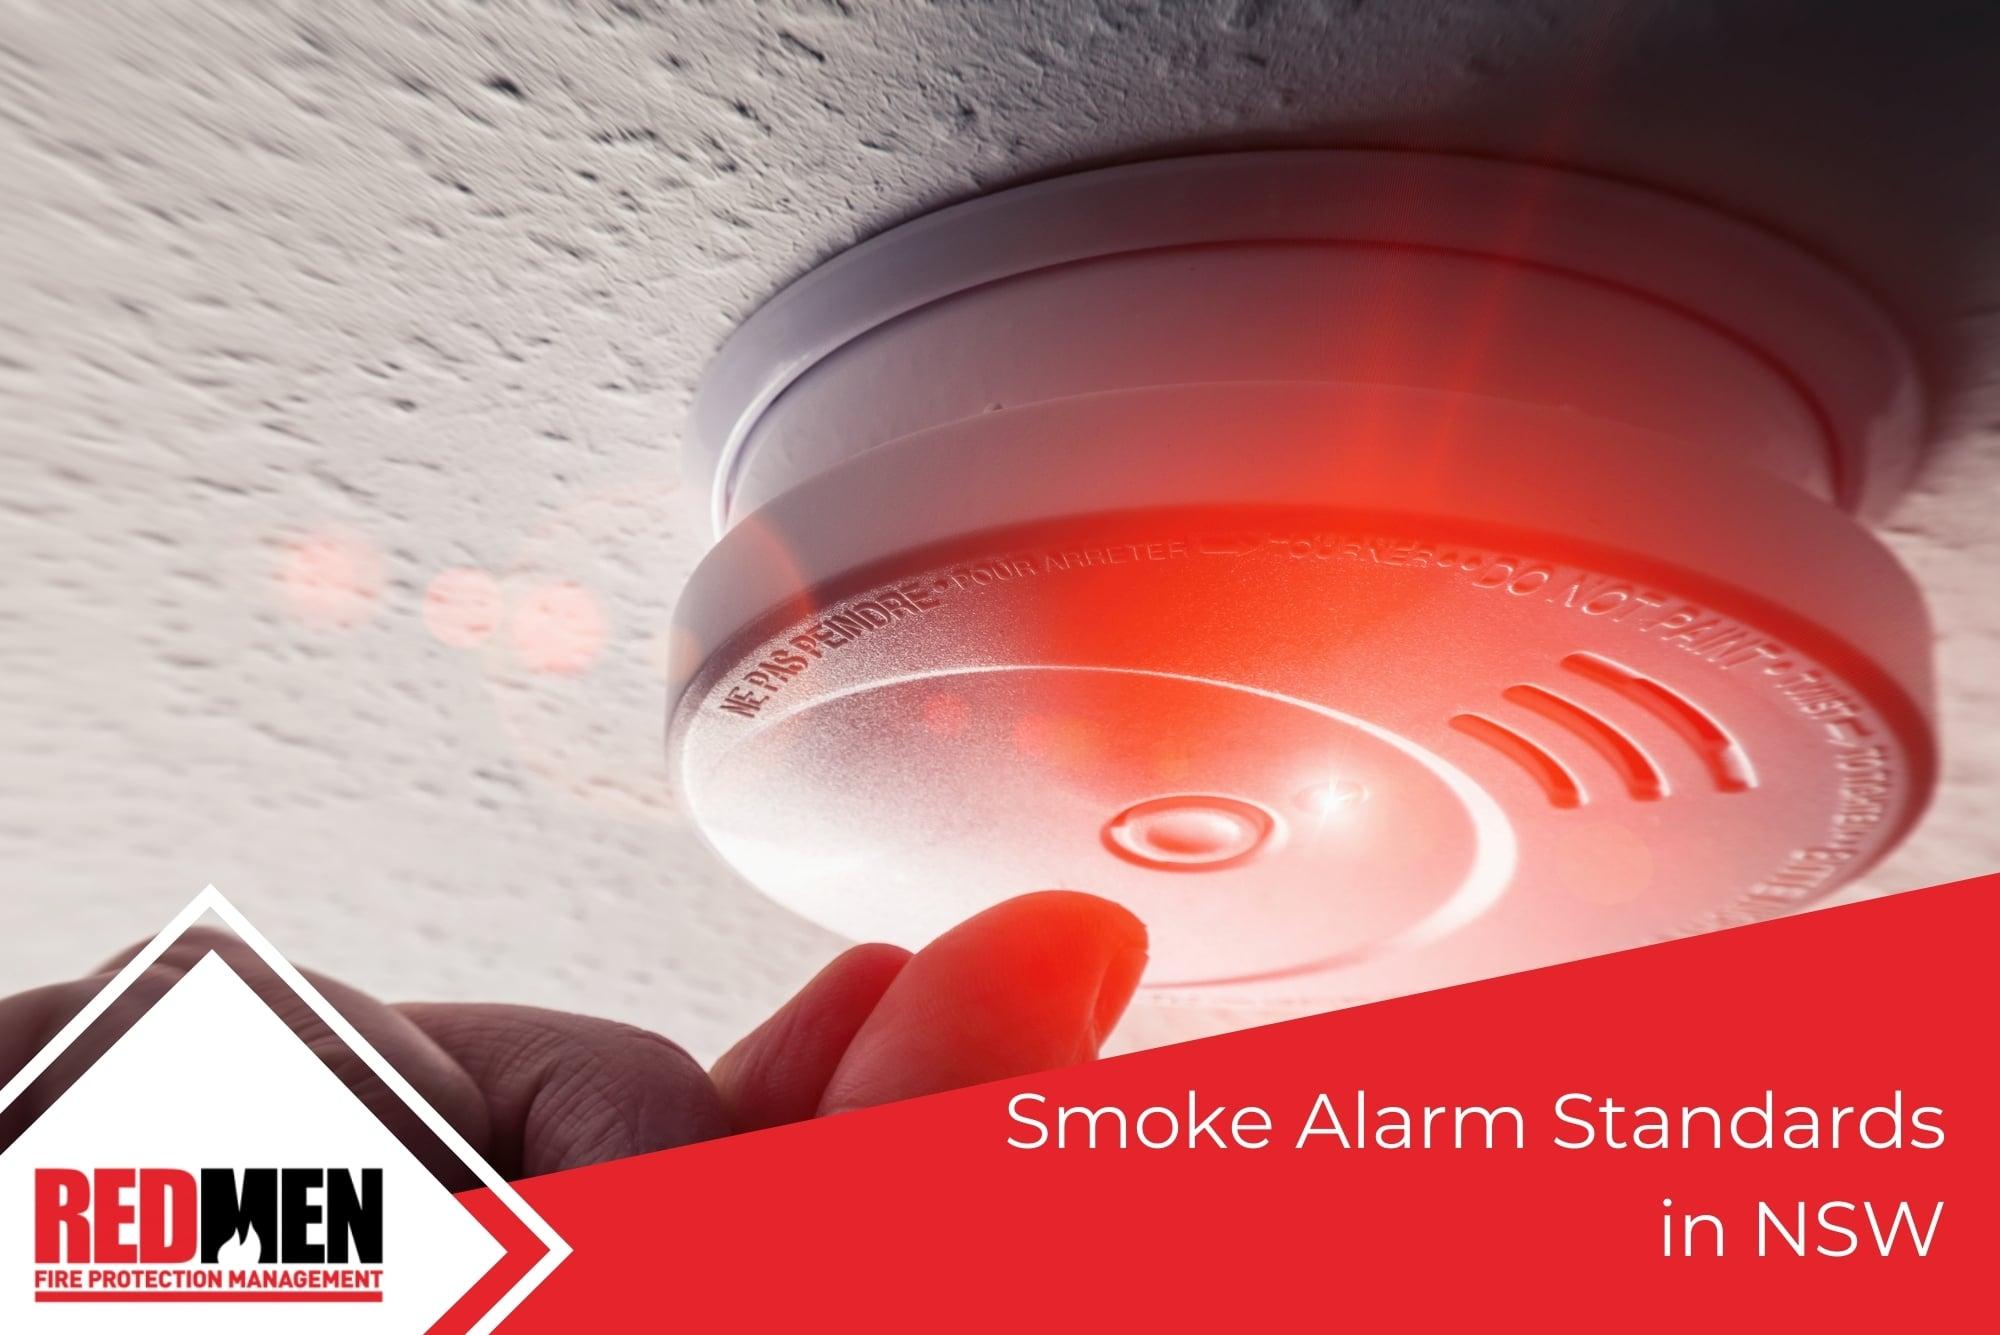 Smoke Alarm Standards in NSW